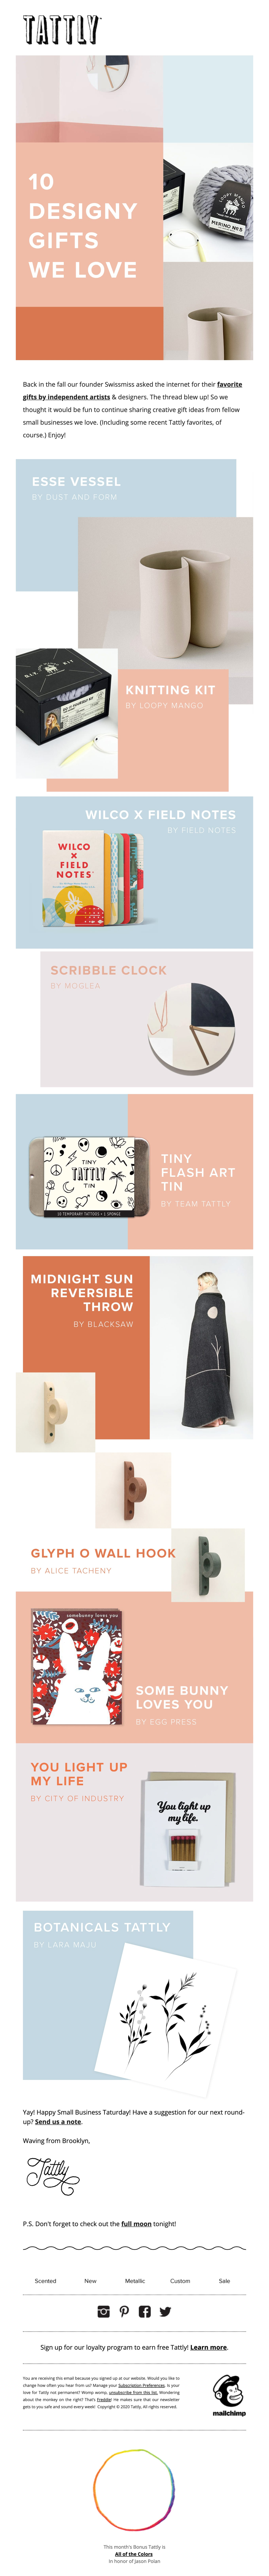 Designy Gifts We Love Email Screenshot